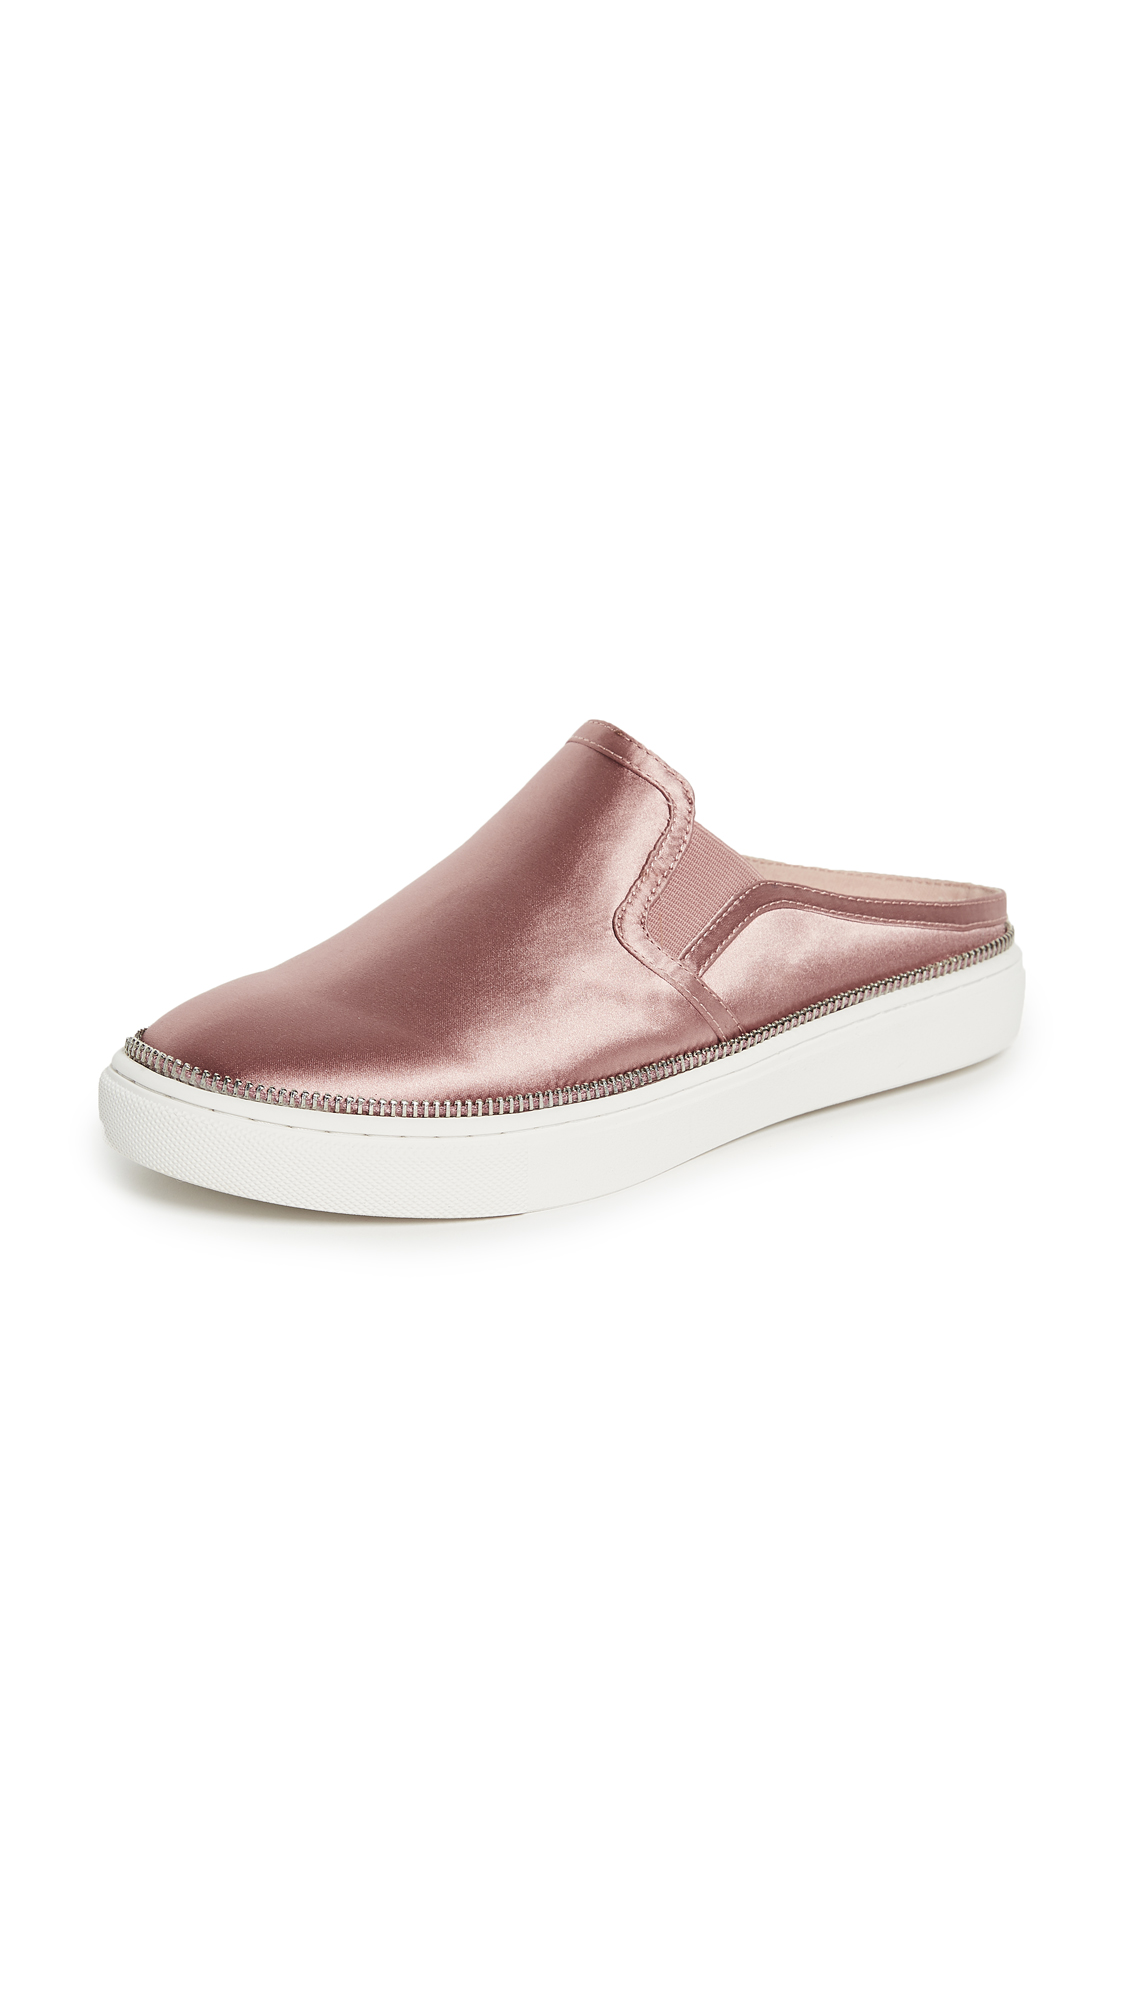 Botkier Hayden Mule Sneakers - Blush